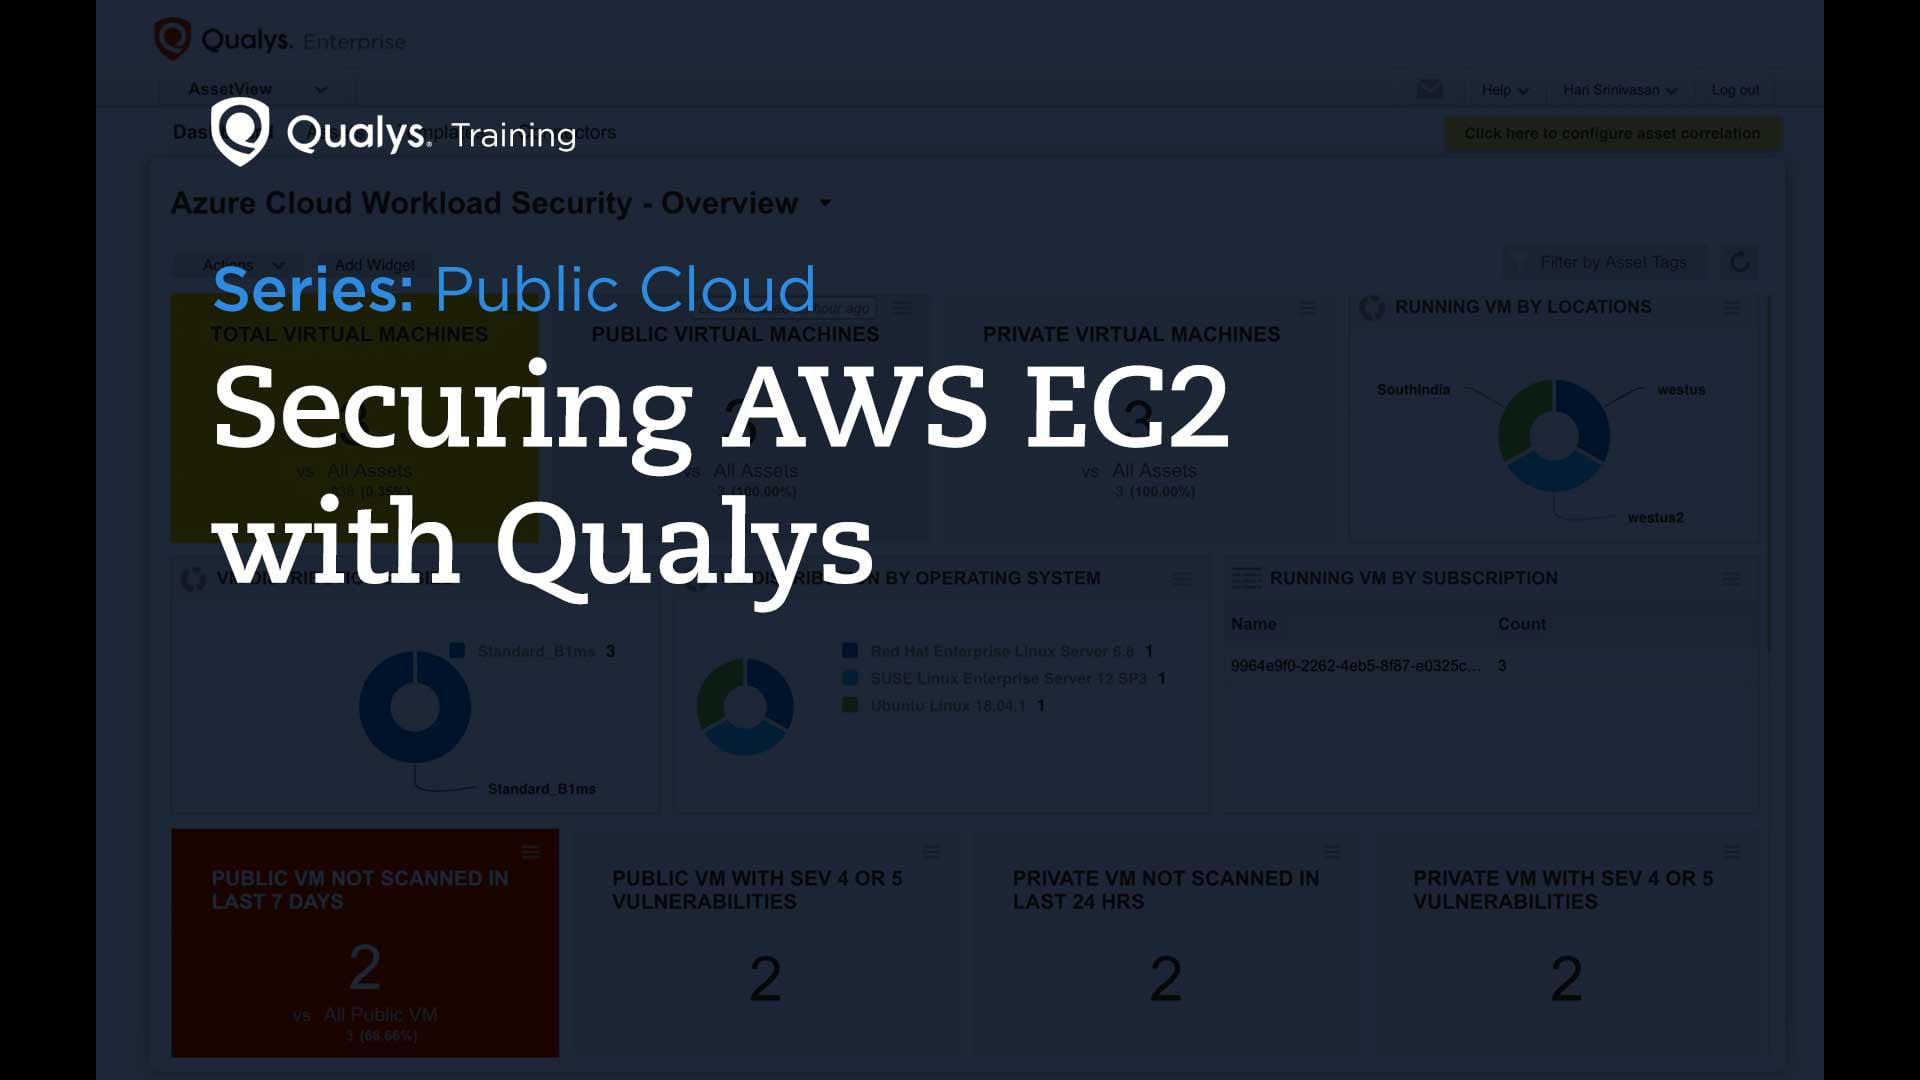 Securing AWS EC2 with Qualys